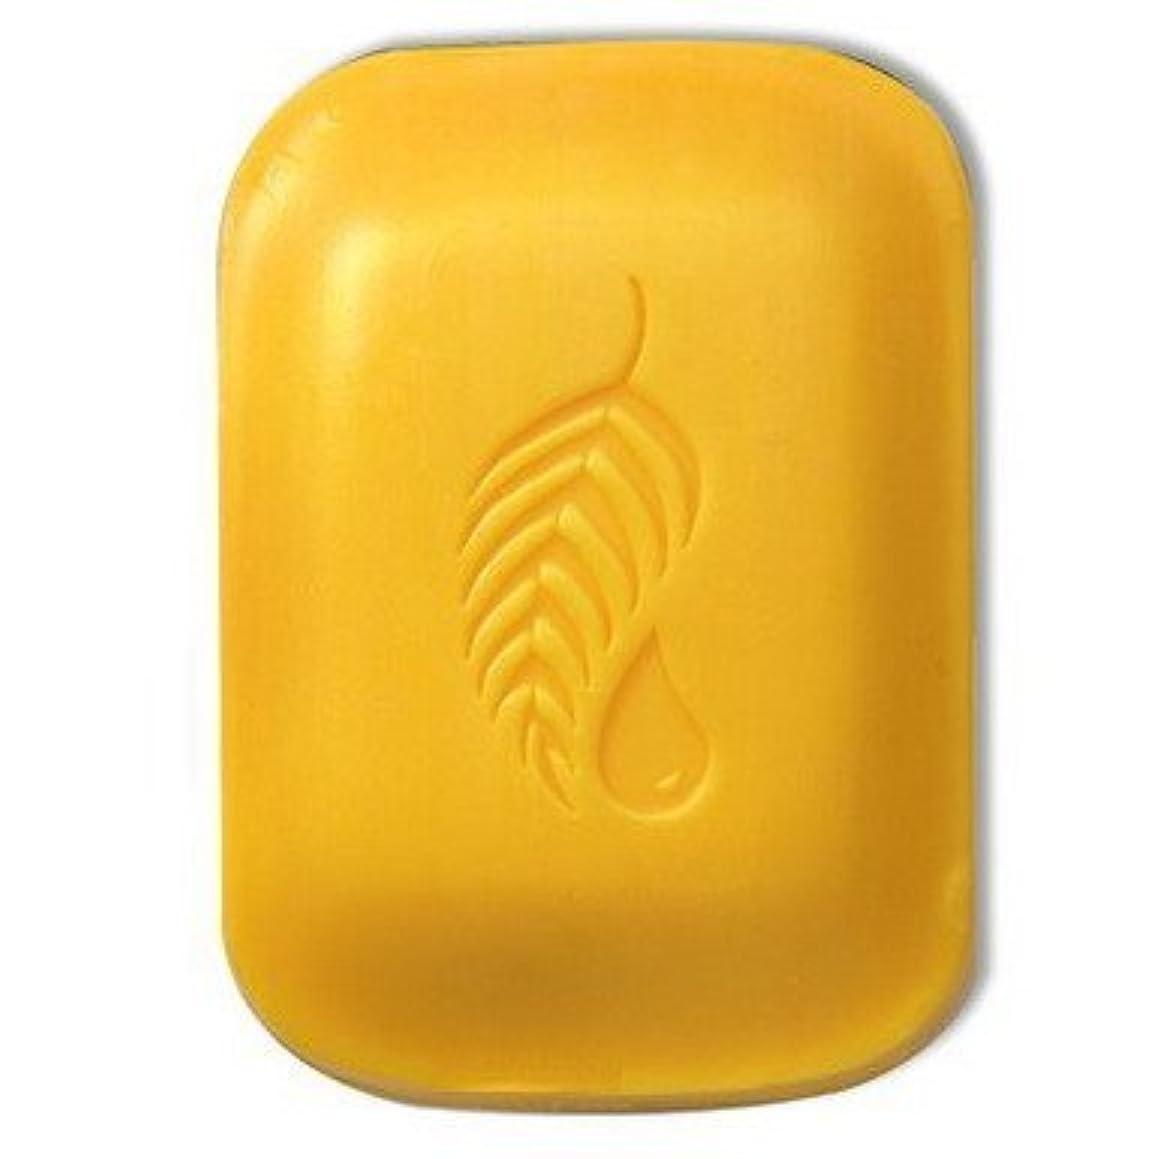 【Melaleuca(メラルーカ)】ゴールド バー 127.5g [並行輸入品]